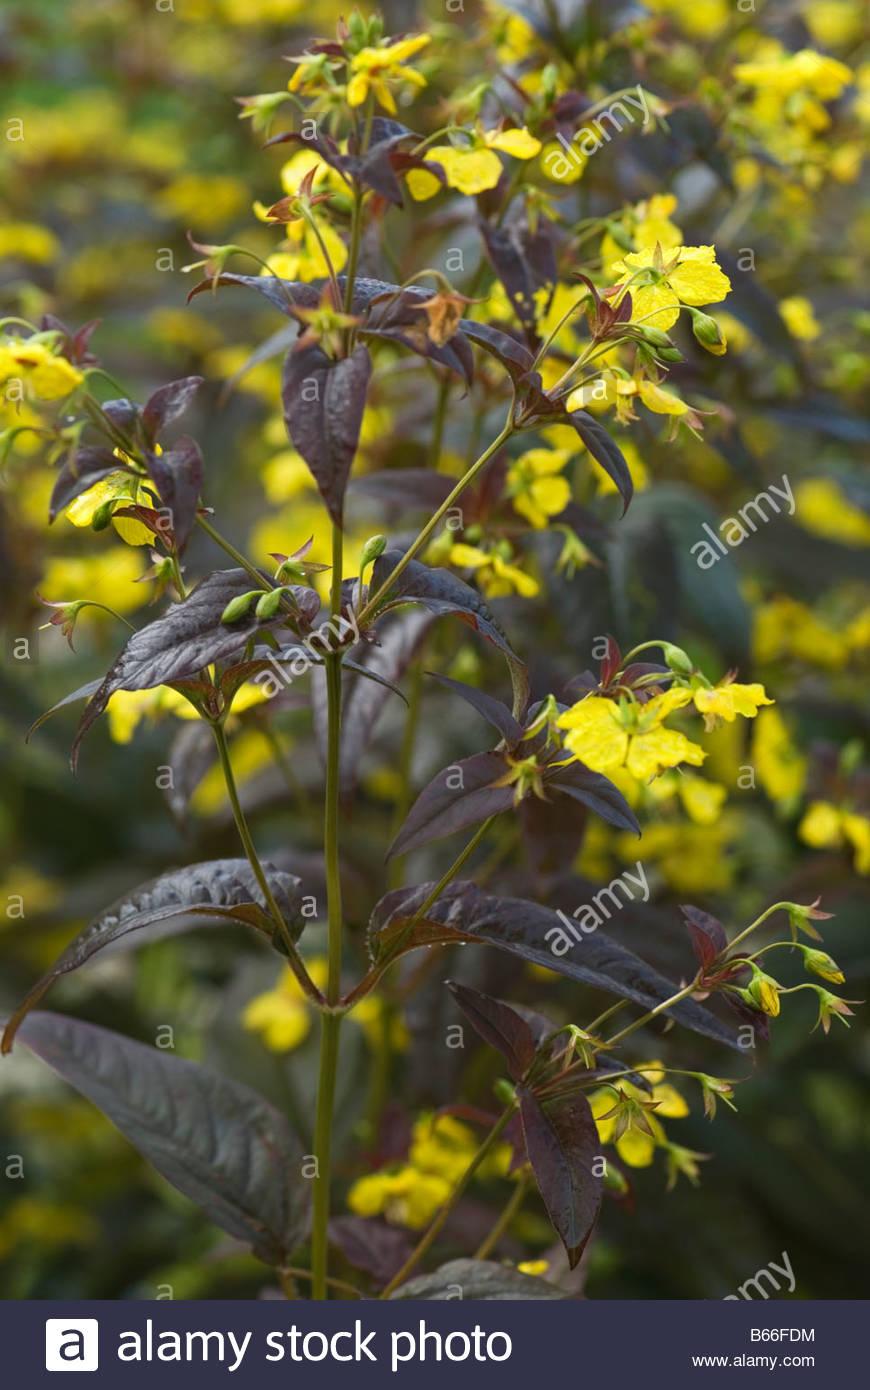 Deep Purple Brown Foliage And Small Yellow Flowers Of Lysimachia